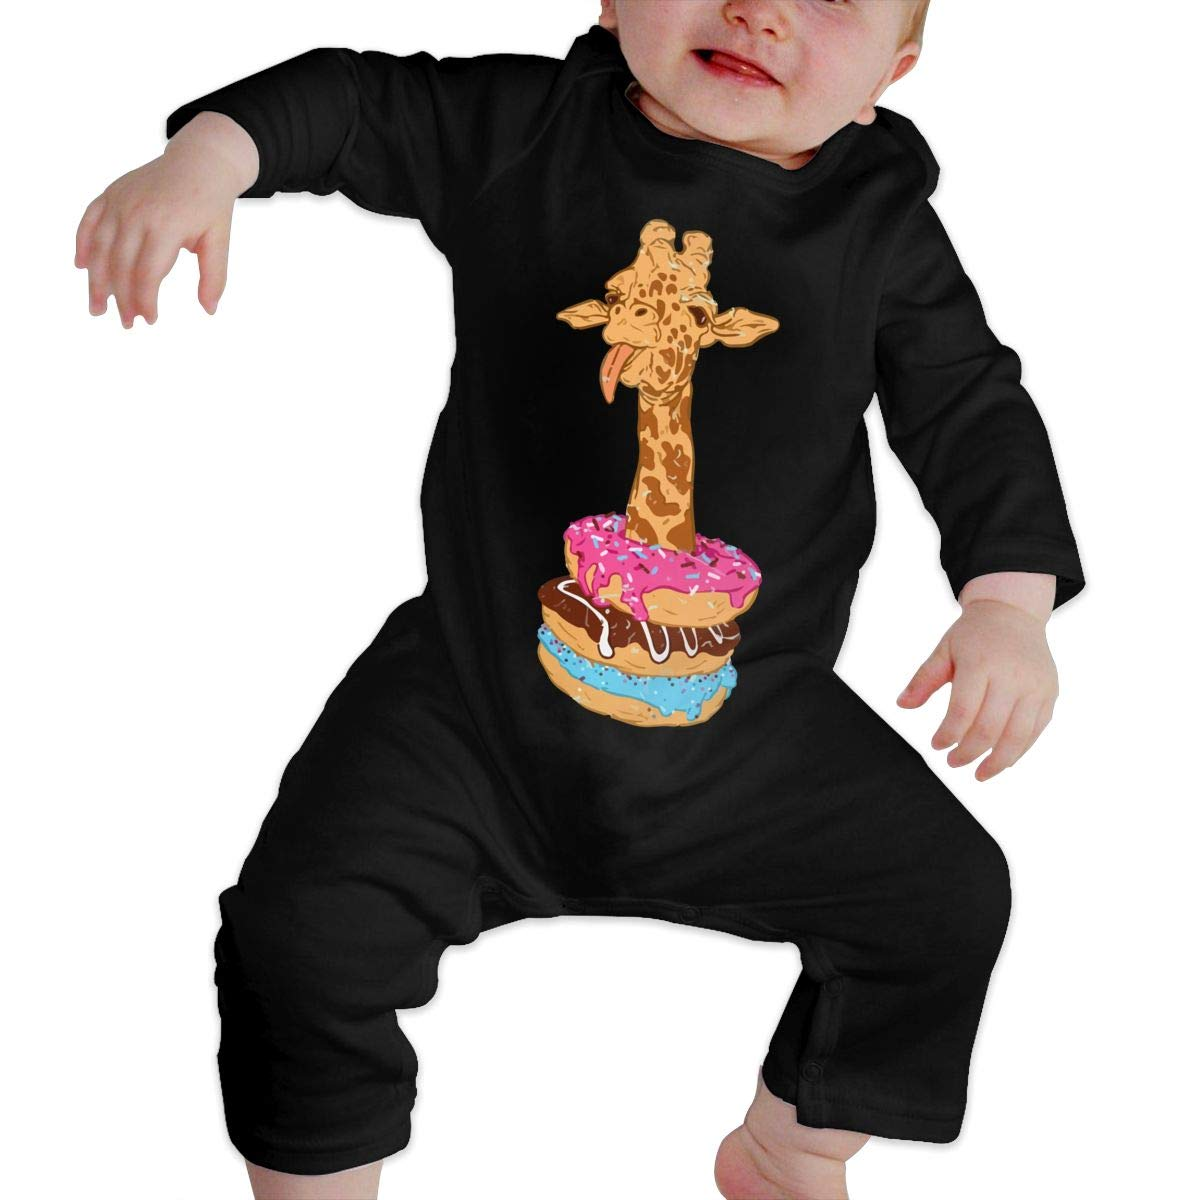 Mri-le1 Baby Boy Girl Coverall Giraffe Donut Baby Clothes